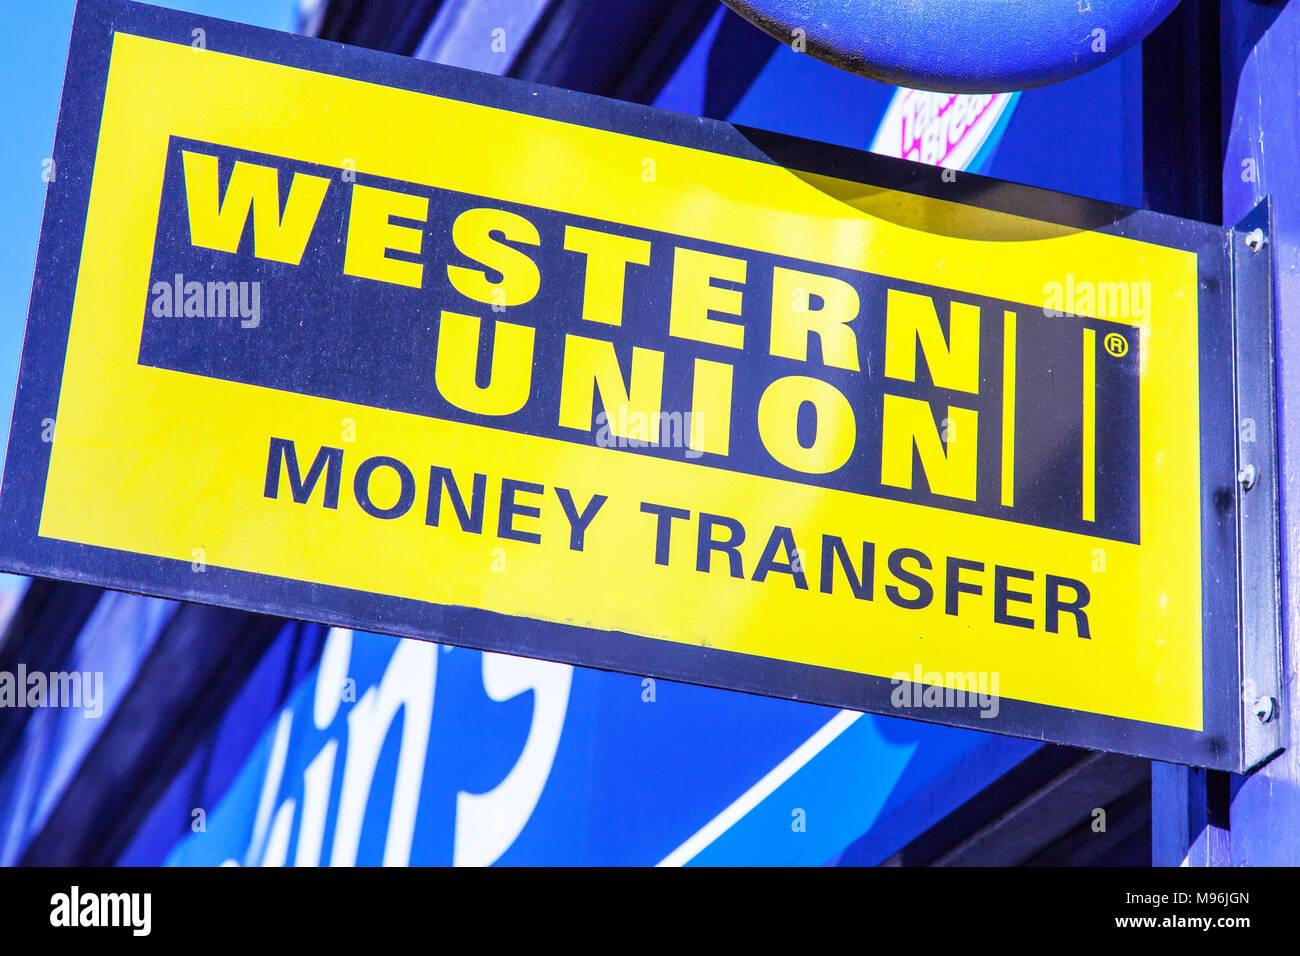 177781877 Company Transfer Company - Stock Western Uk Sign Sign Union Photo Name Alamy Shop Money